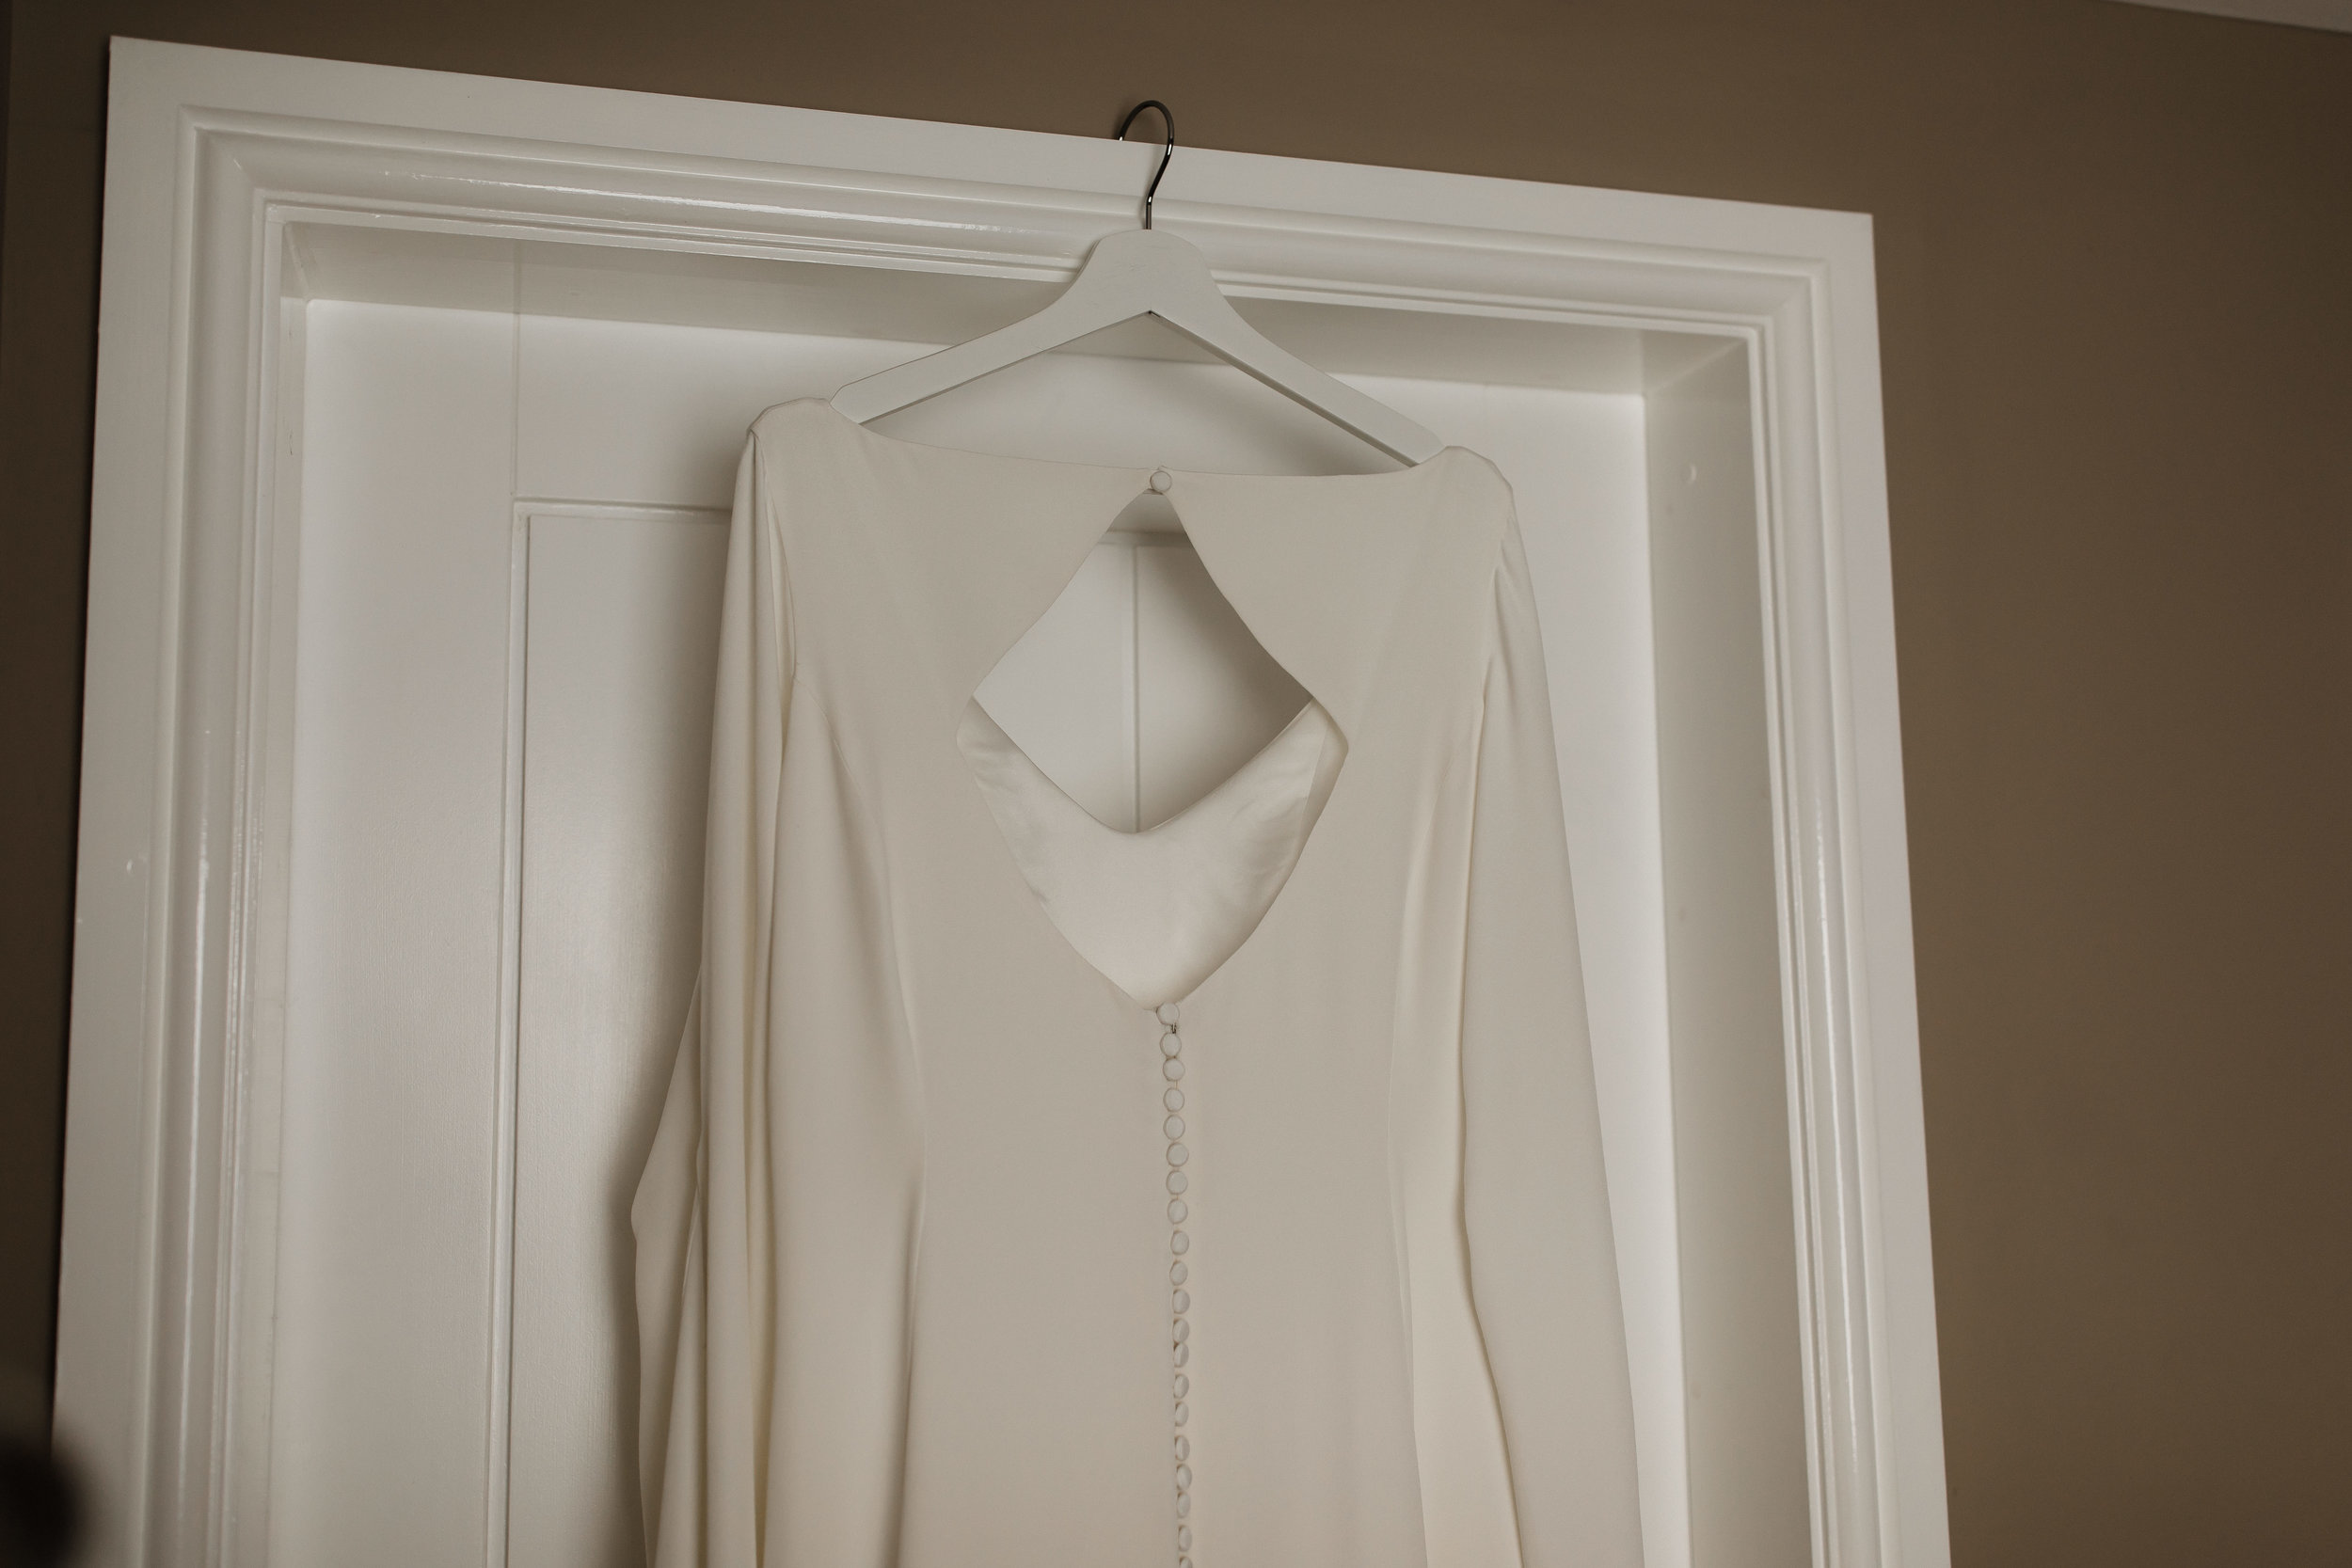 Lauren-Peak-District-Bespoke-Wedding-Gown-Petal-Veil-Train-Long-Sleeve-Susanna-Greening-Designs-Matlock-Derbyshire-9